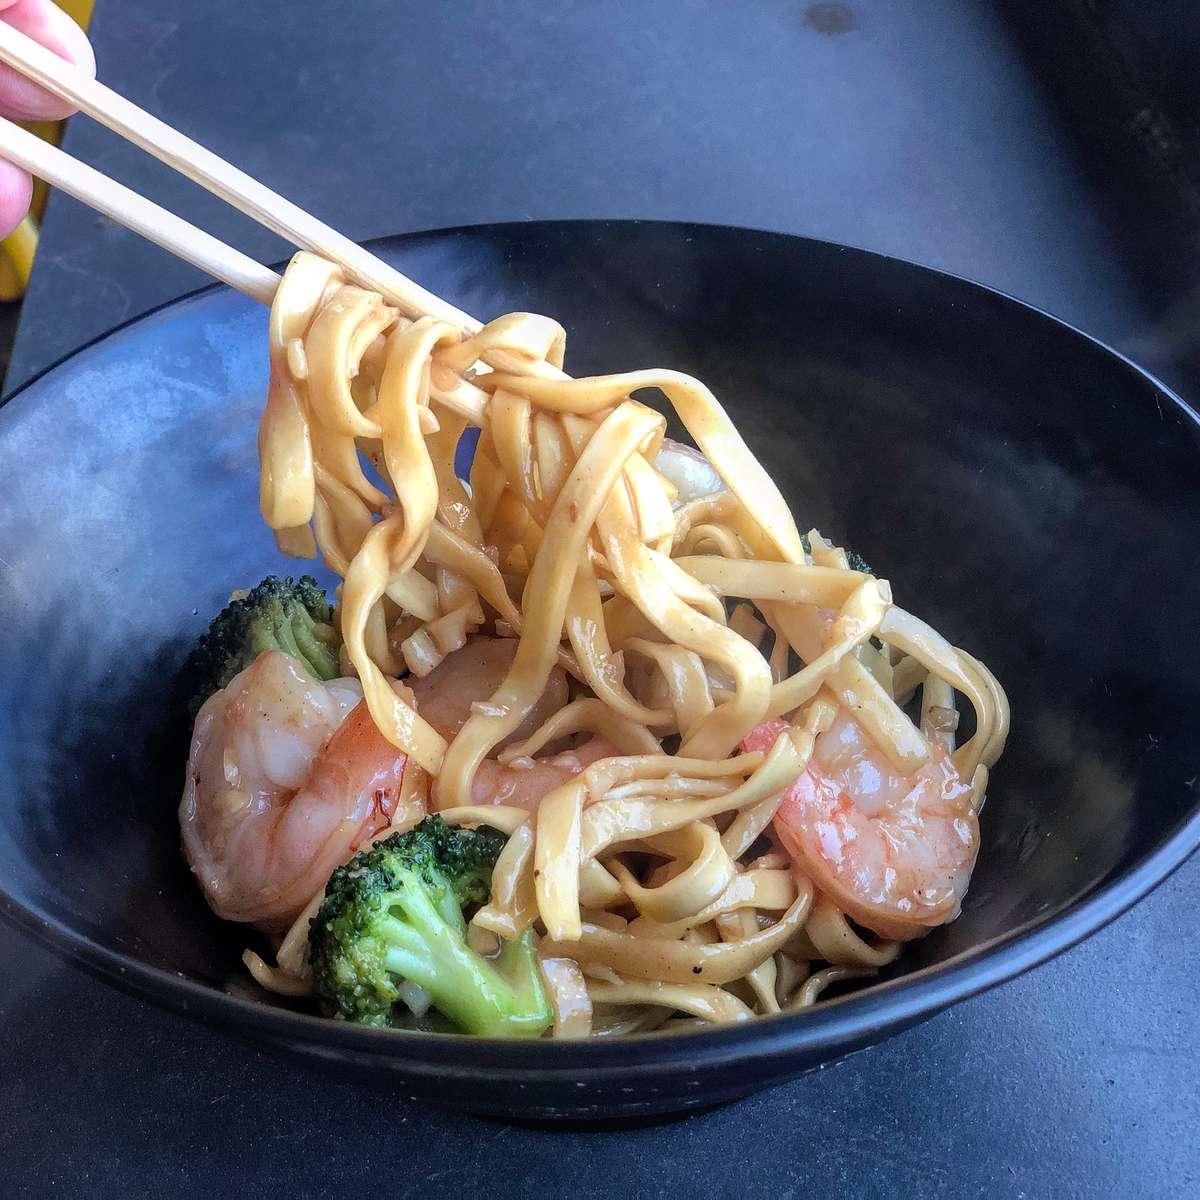 Mì Xào Tỏi, Vietnamese Garlic Noodle